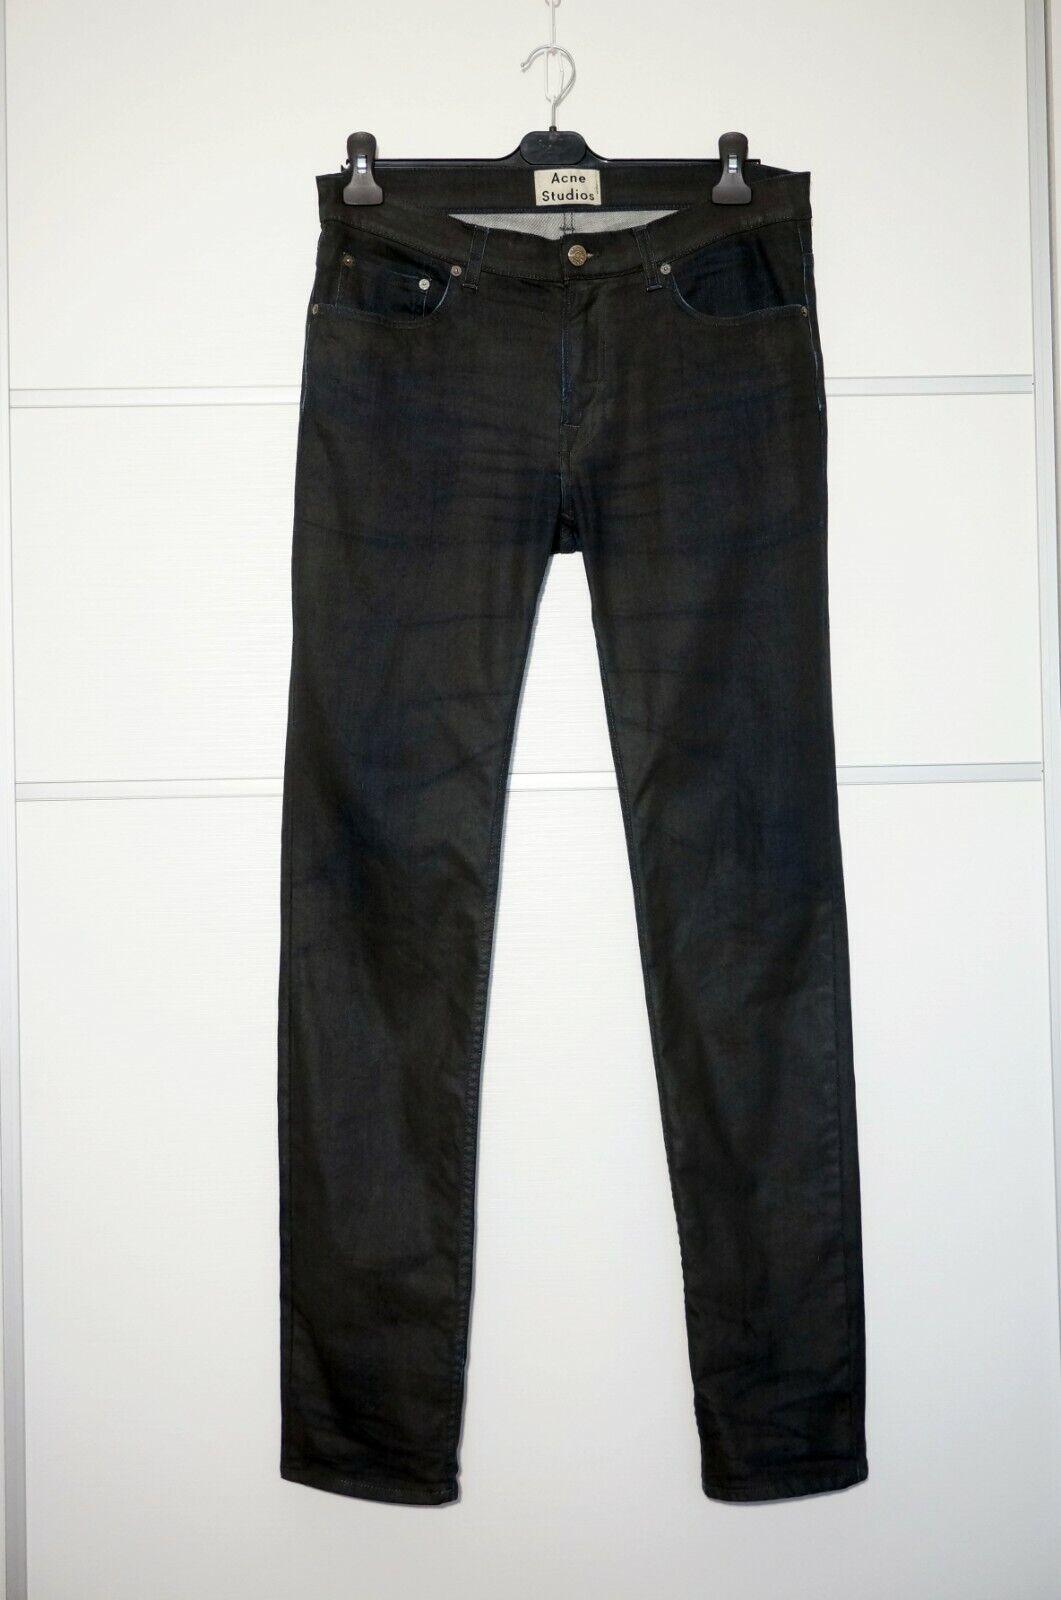 Acne Studios Graphite bluee Ace Commander Straight Jeans, Size 34 34